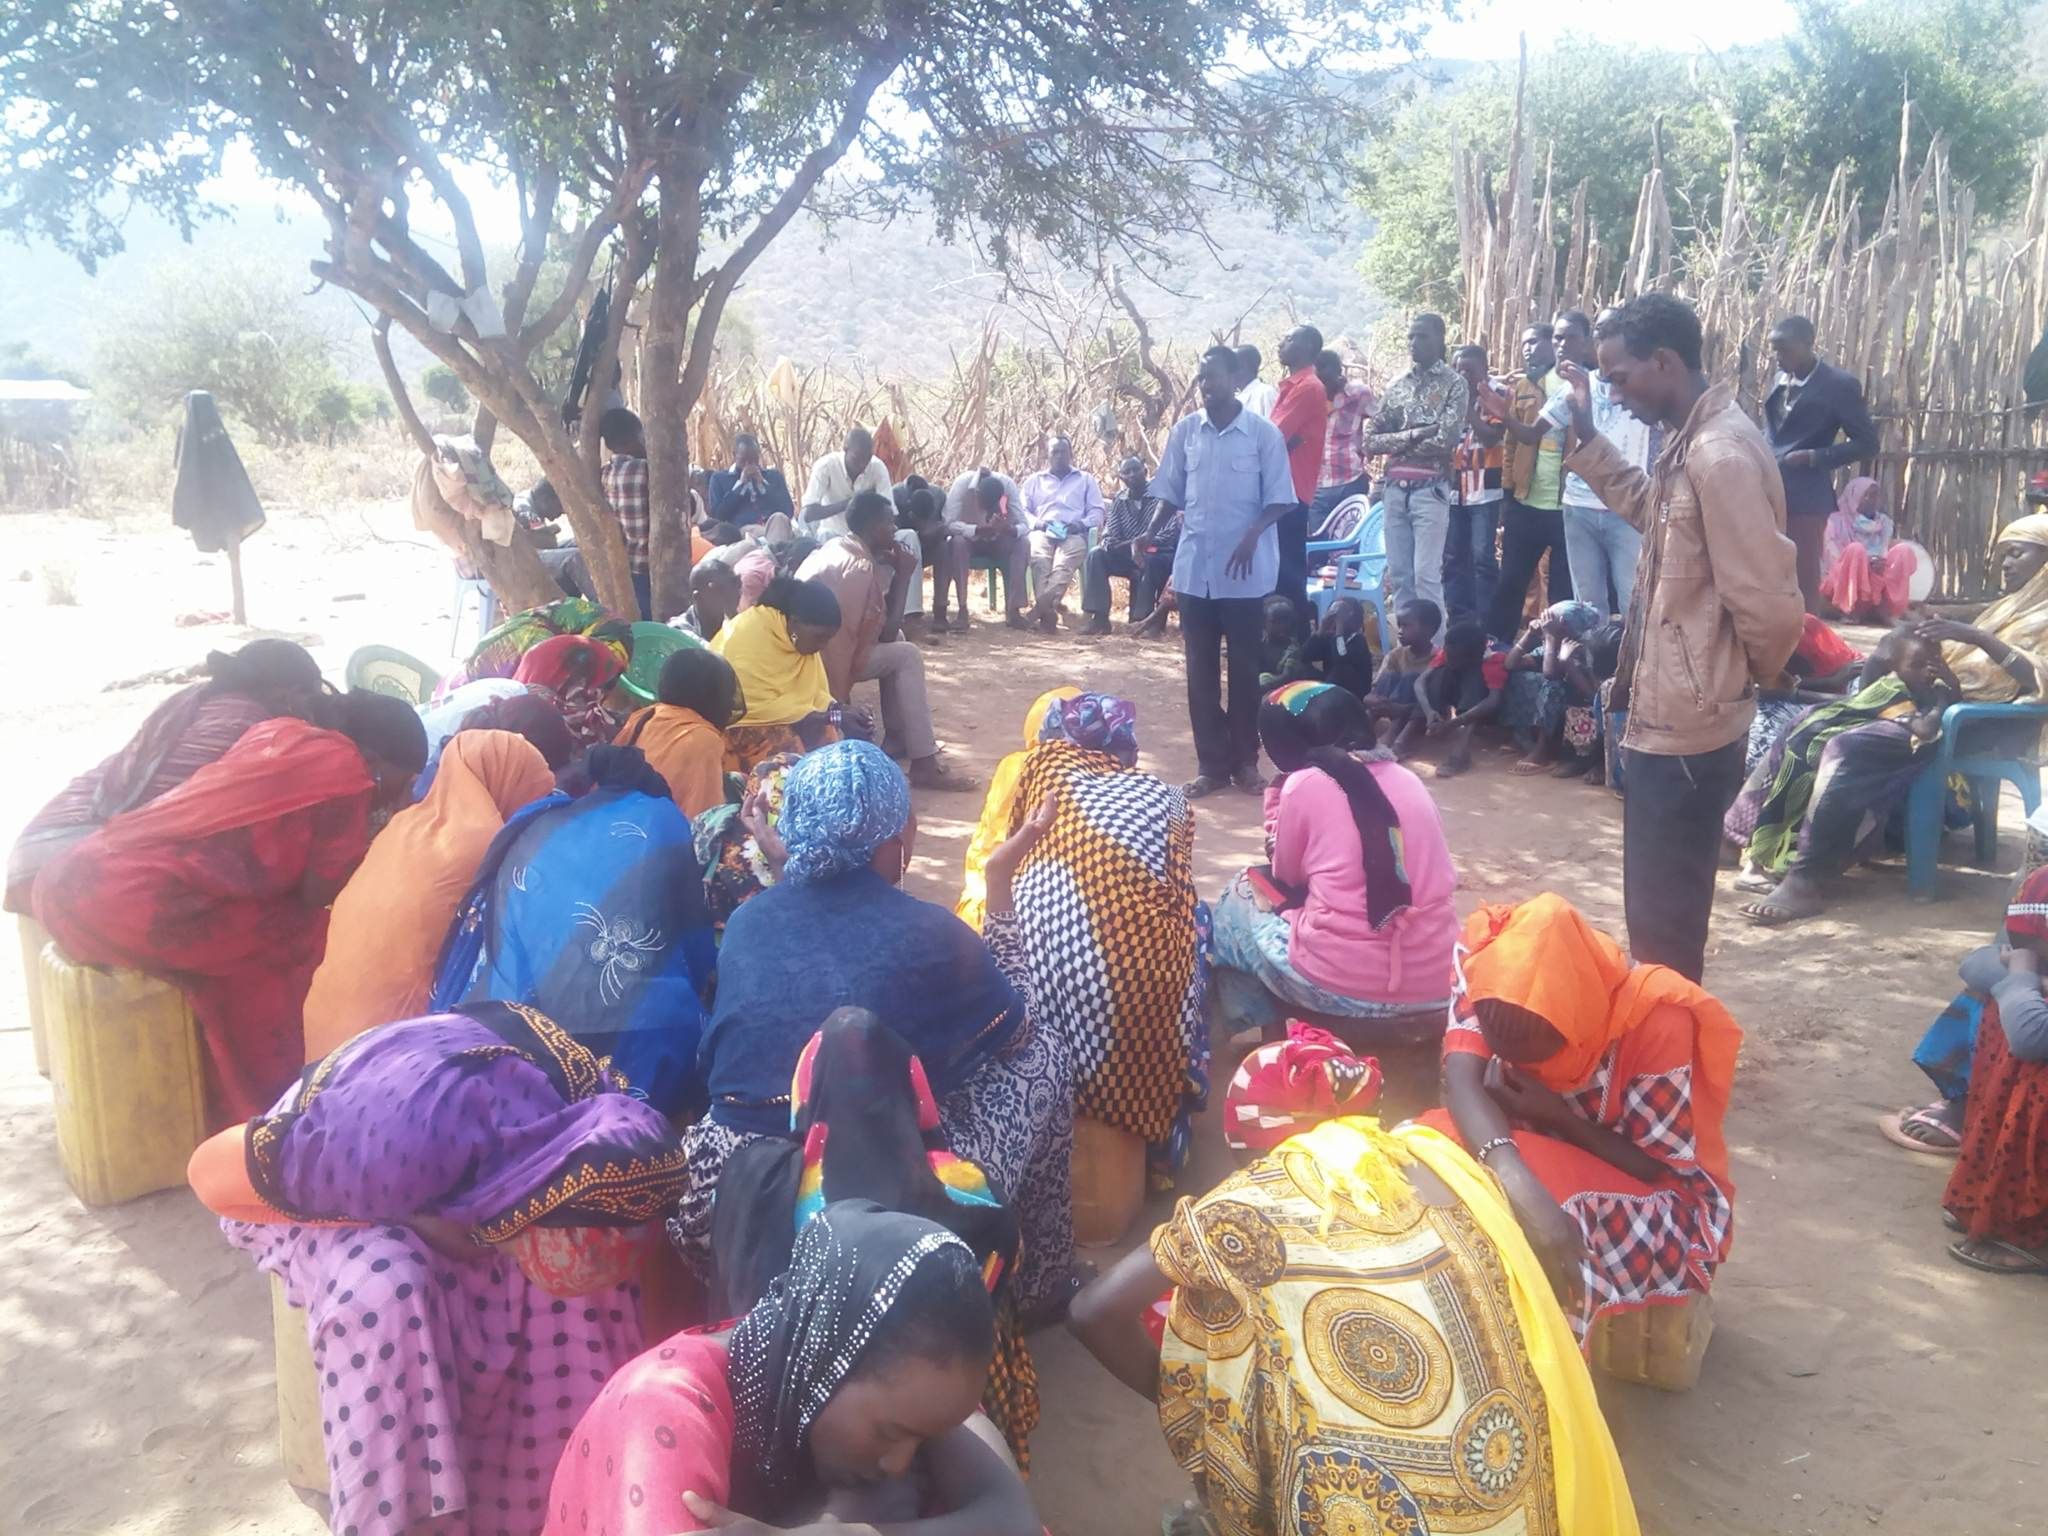 brothers william and Johsua worship and prayer muslims gmfc Kenya church under tree 33